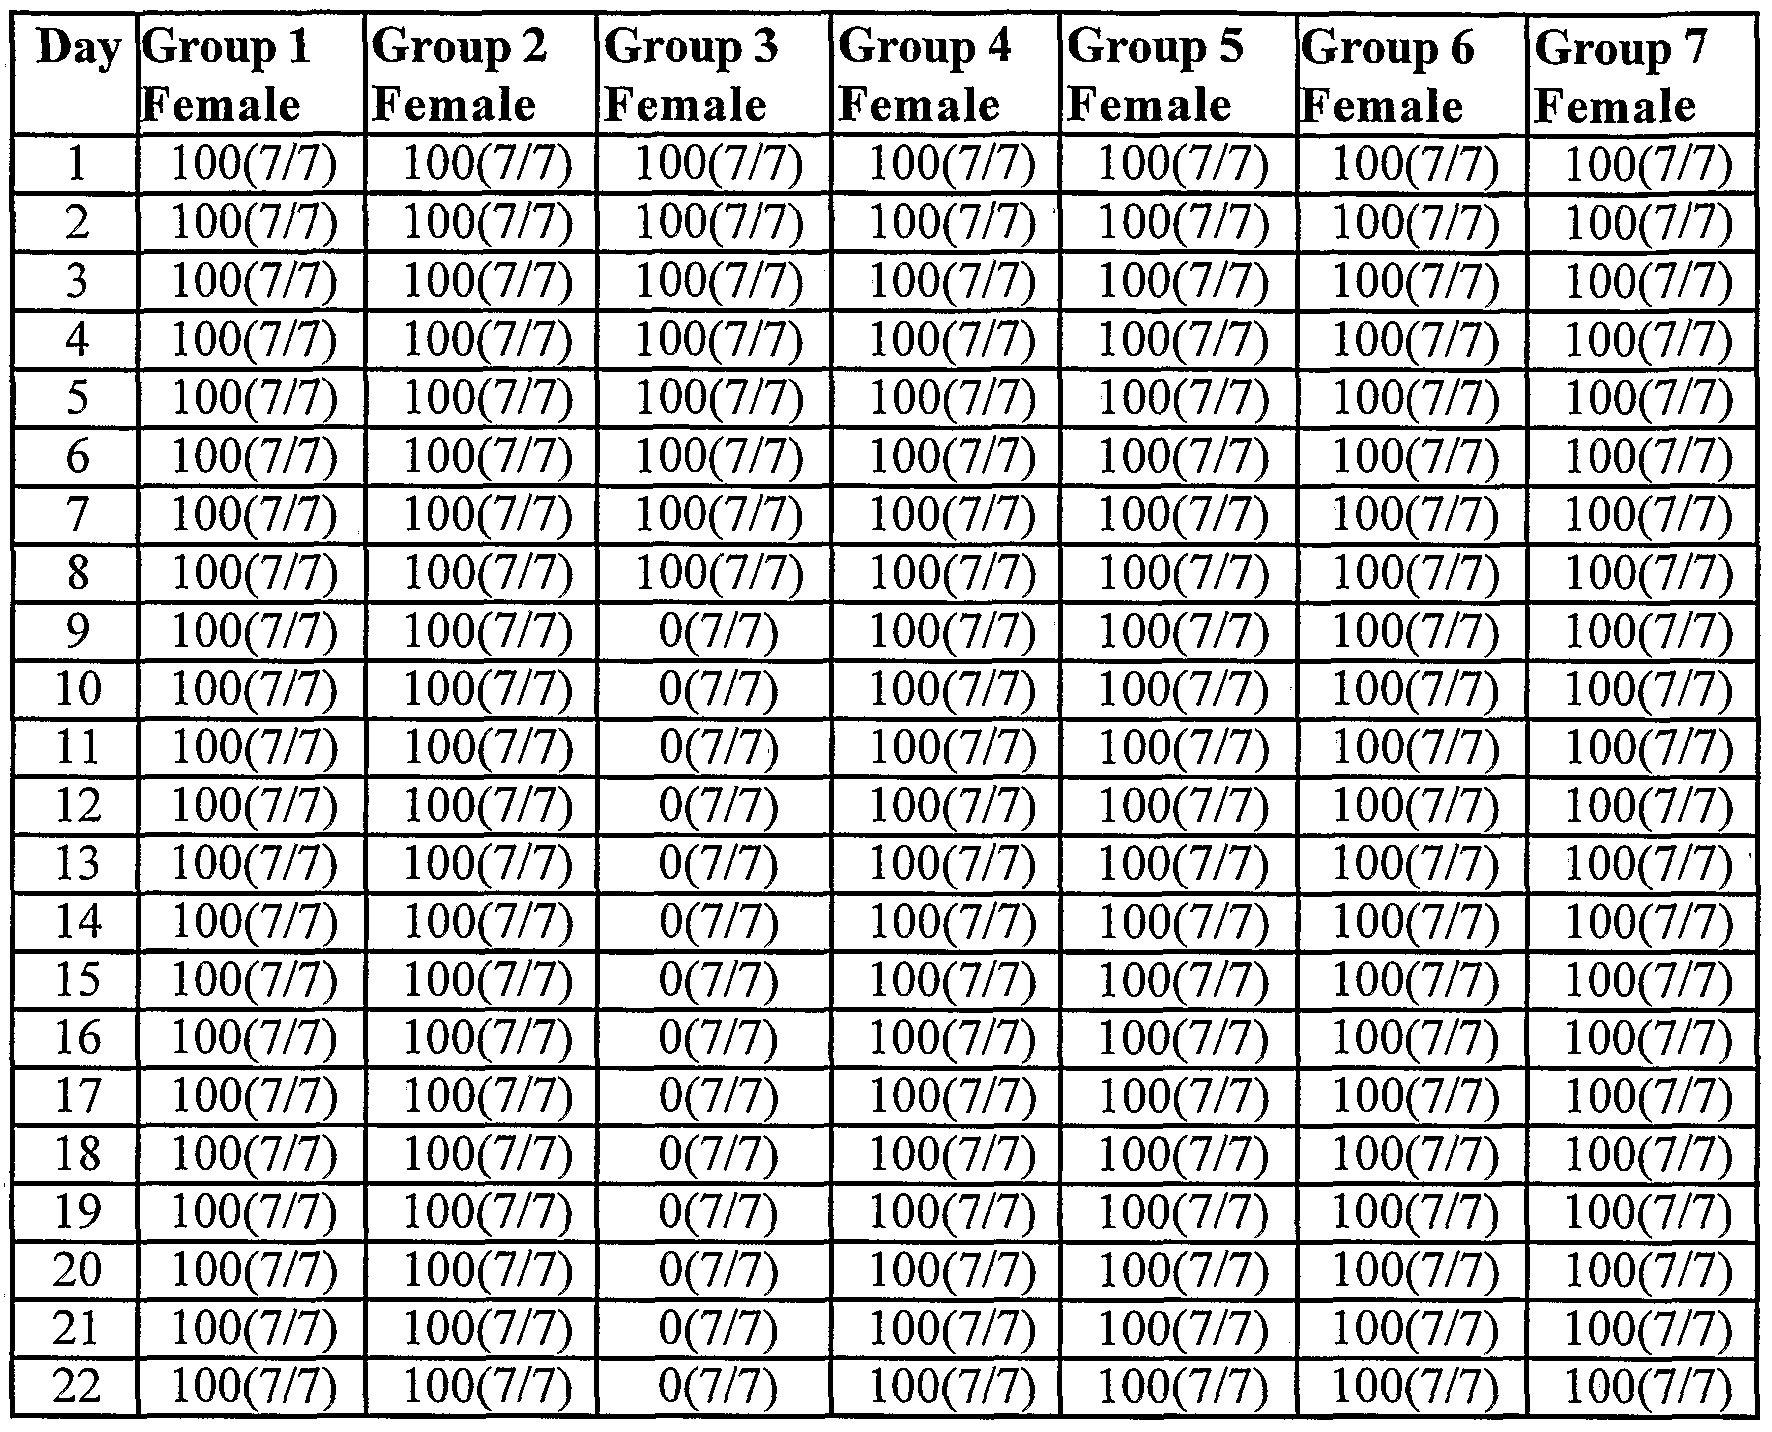 Multi Dose Vial Expiration Date Calendar : Free Calendar Free 12 Month Calendar Template For Expiry Dates